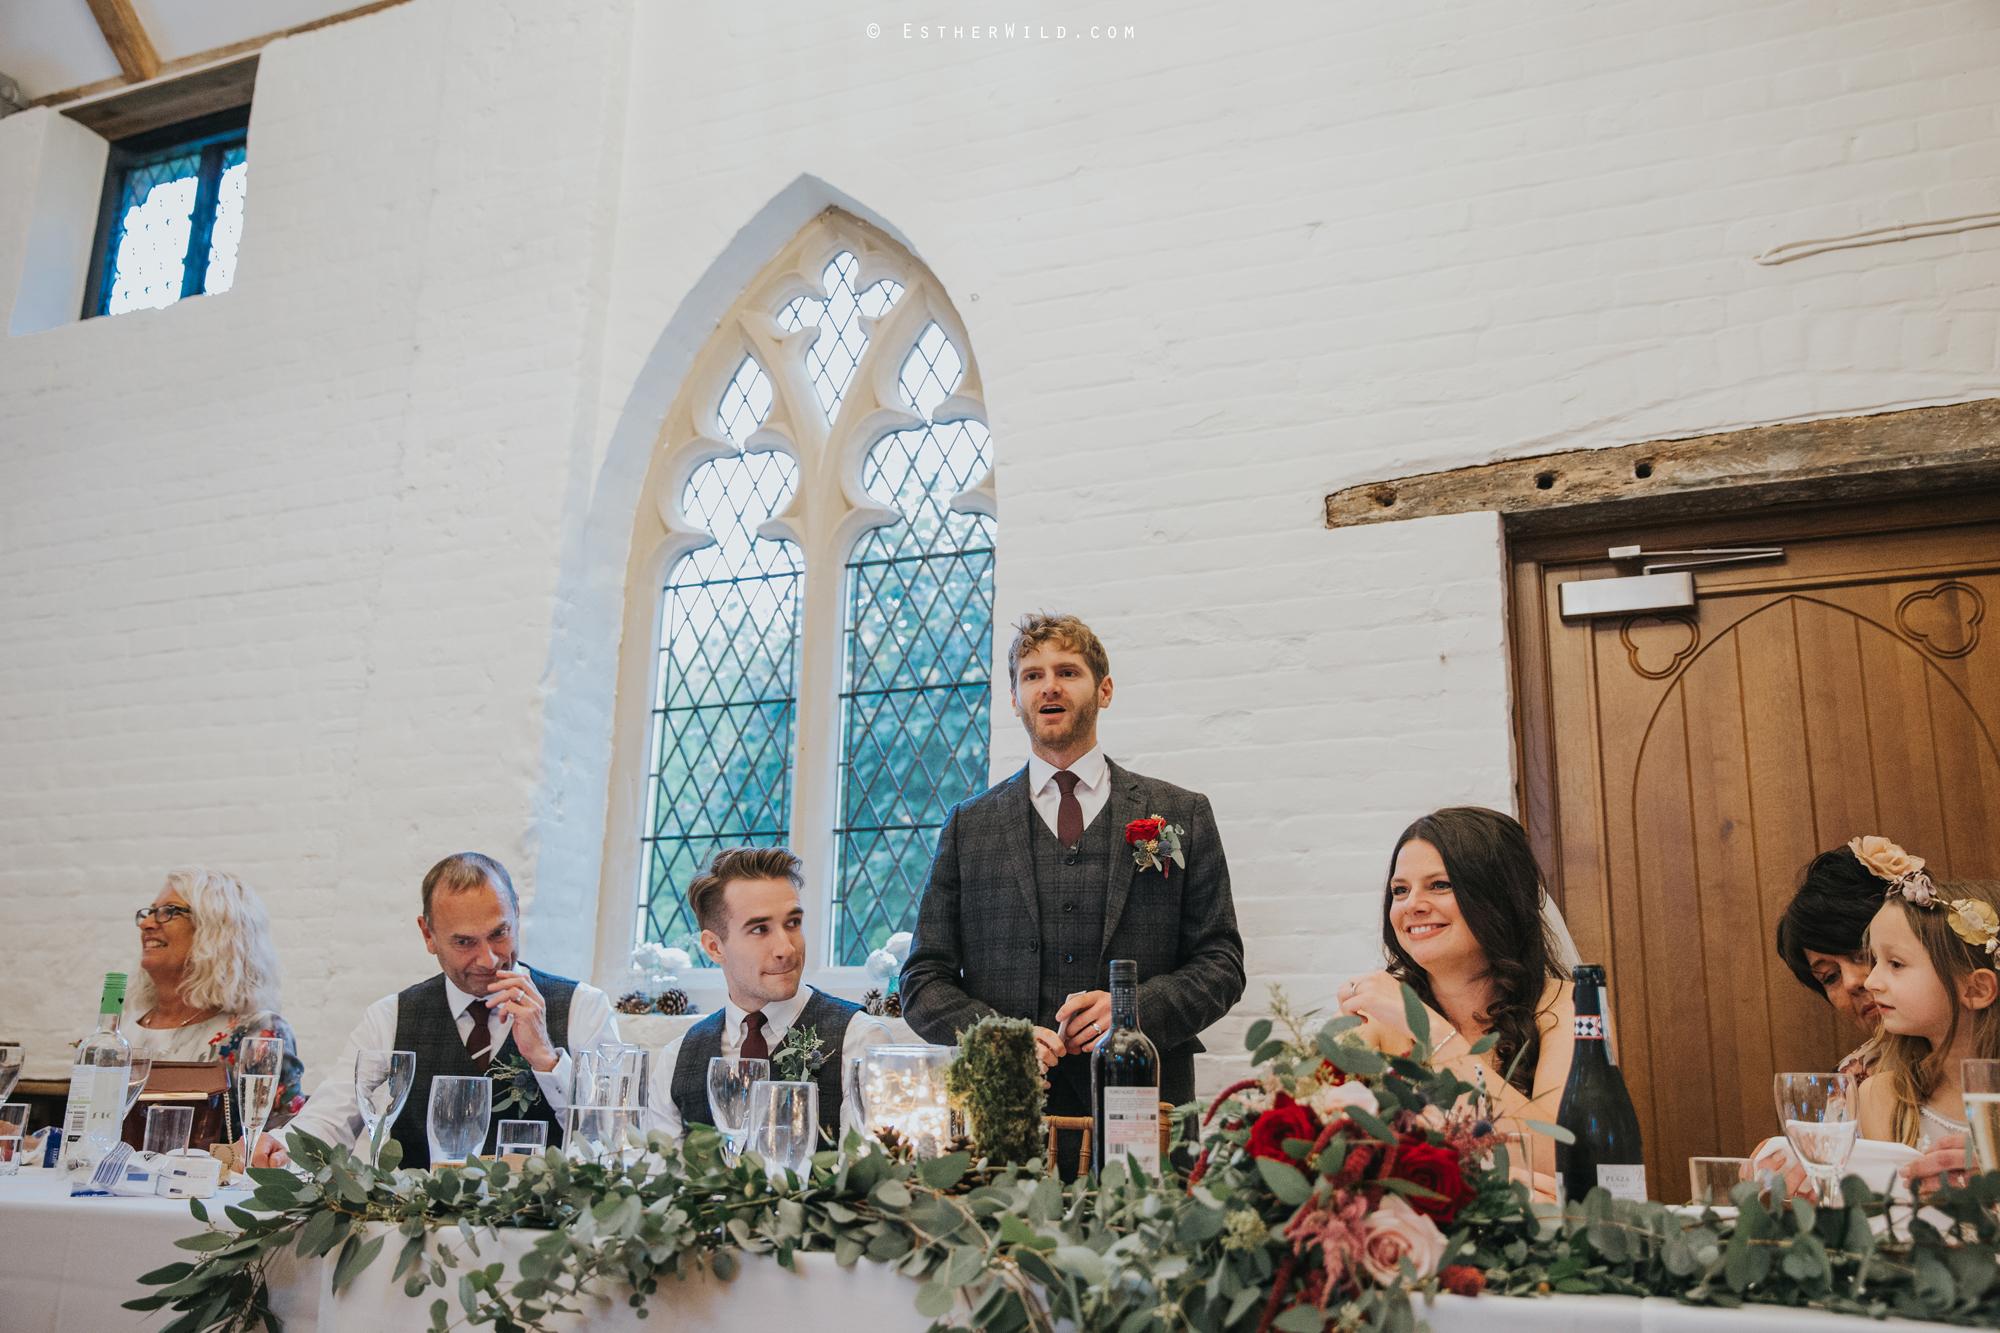 Reading_Room_Weddings_Alby_Norwich_Photographer_Esther_Wild_IMG_2147.jpg